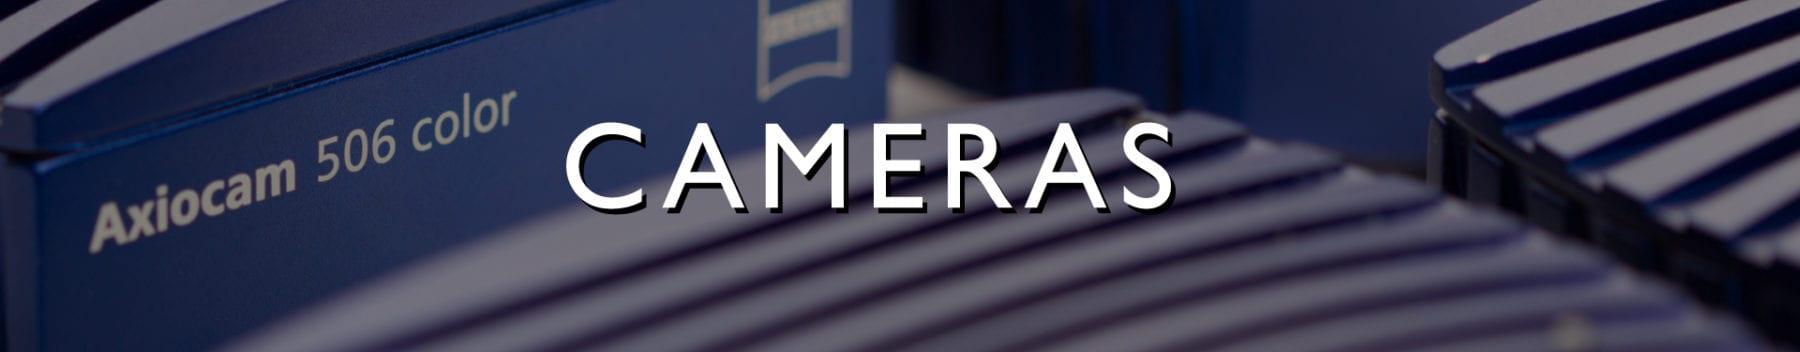 Microscope Cameras - Micro-Optics New York